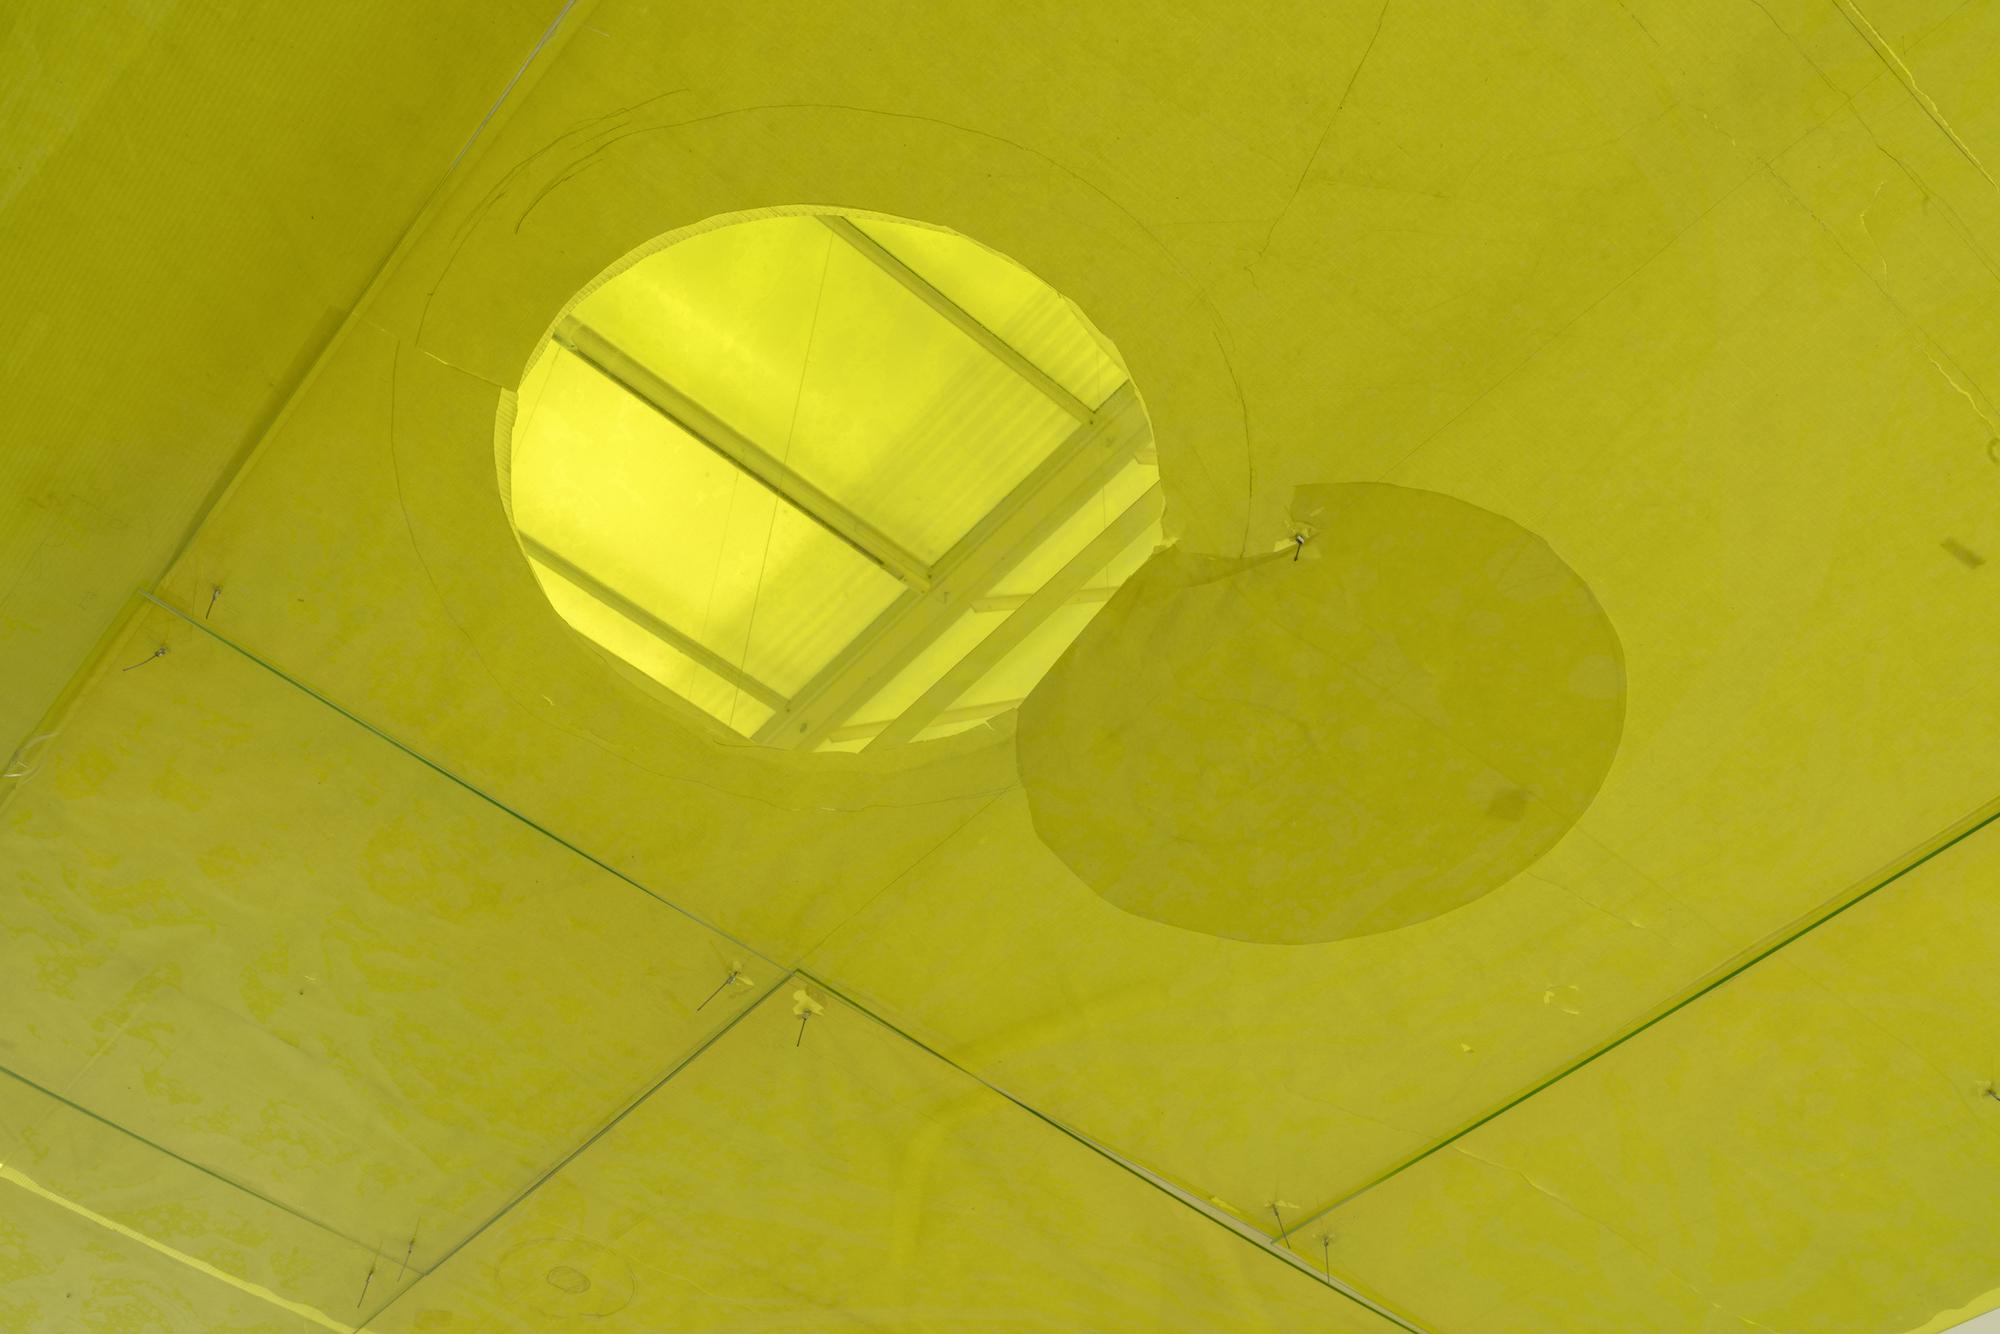 Ian Kiaer, Tooth House, ceiling, 2014, endnote (ping), 2020, Installation View, Heidelberger Kunstverein, 2020 © Heidelberger Kunstverein / Wolfgang Günzel